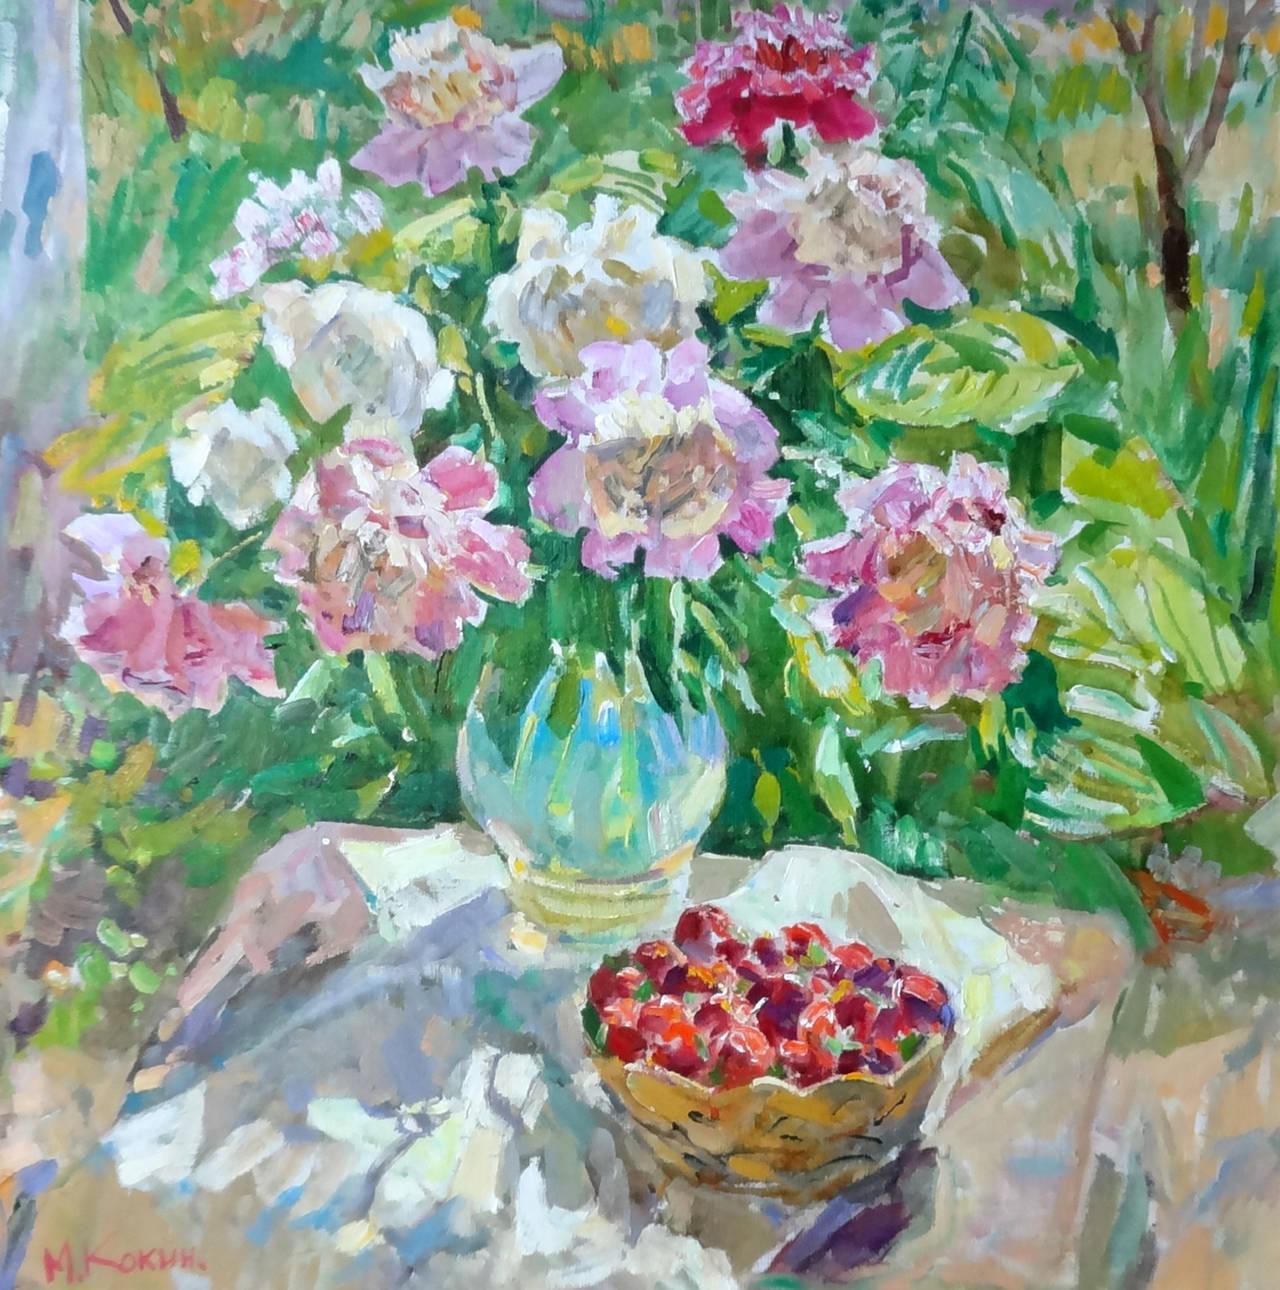 Mikhail Kokin Still-Life Painting - The Strawberry Basket (El Cesto de Fresas)